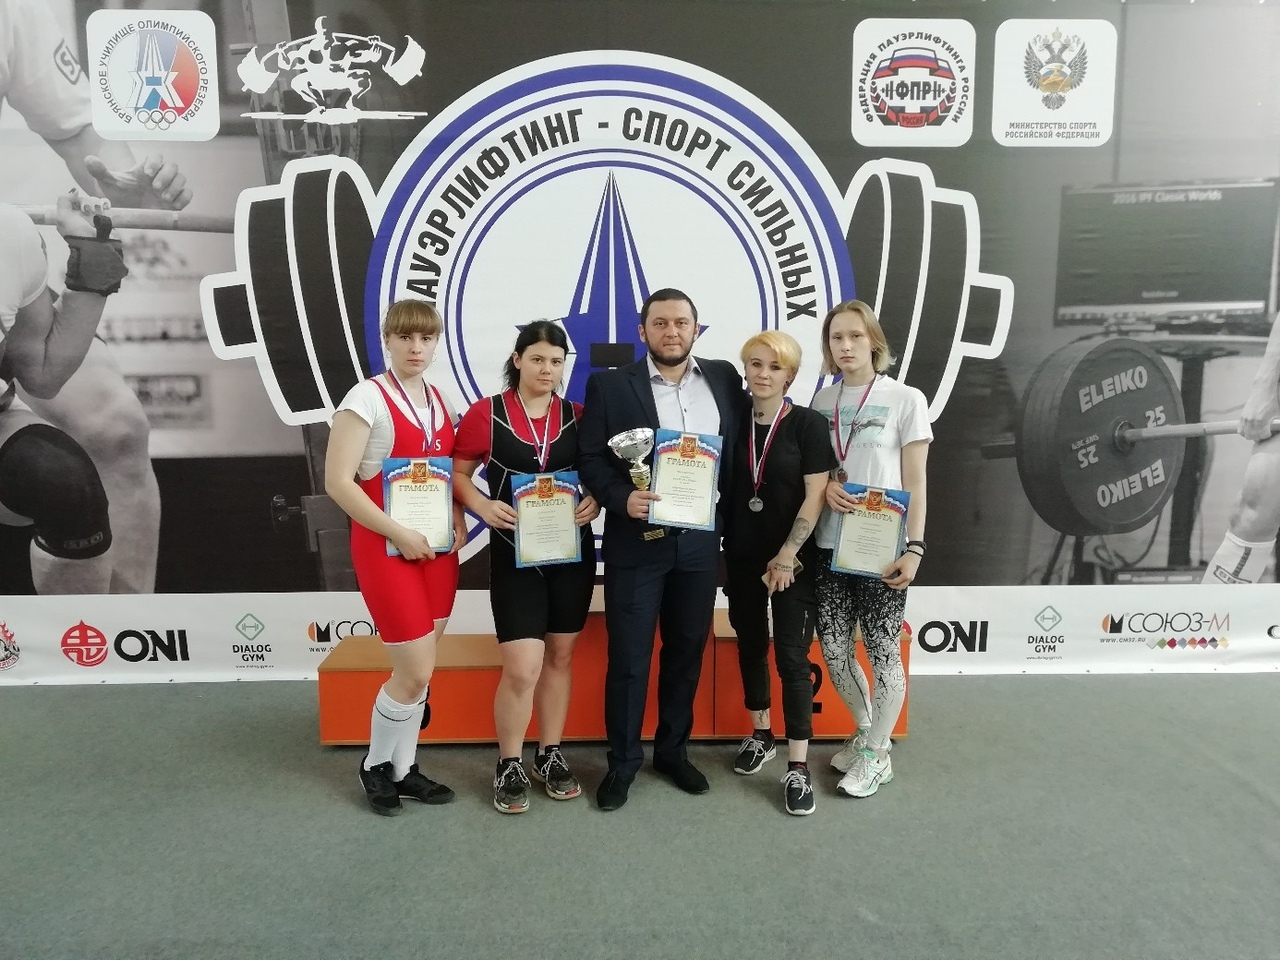 Тамбовчанка установила рекорд России среди спортшкол по пауэрлифтингу